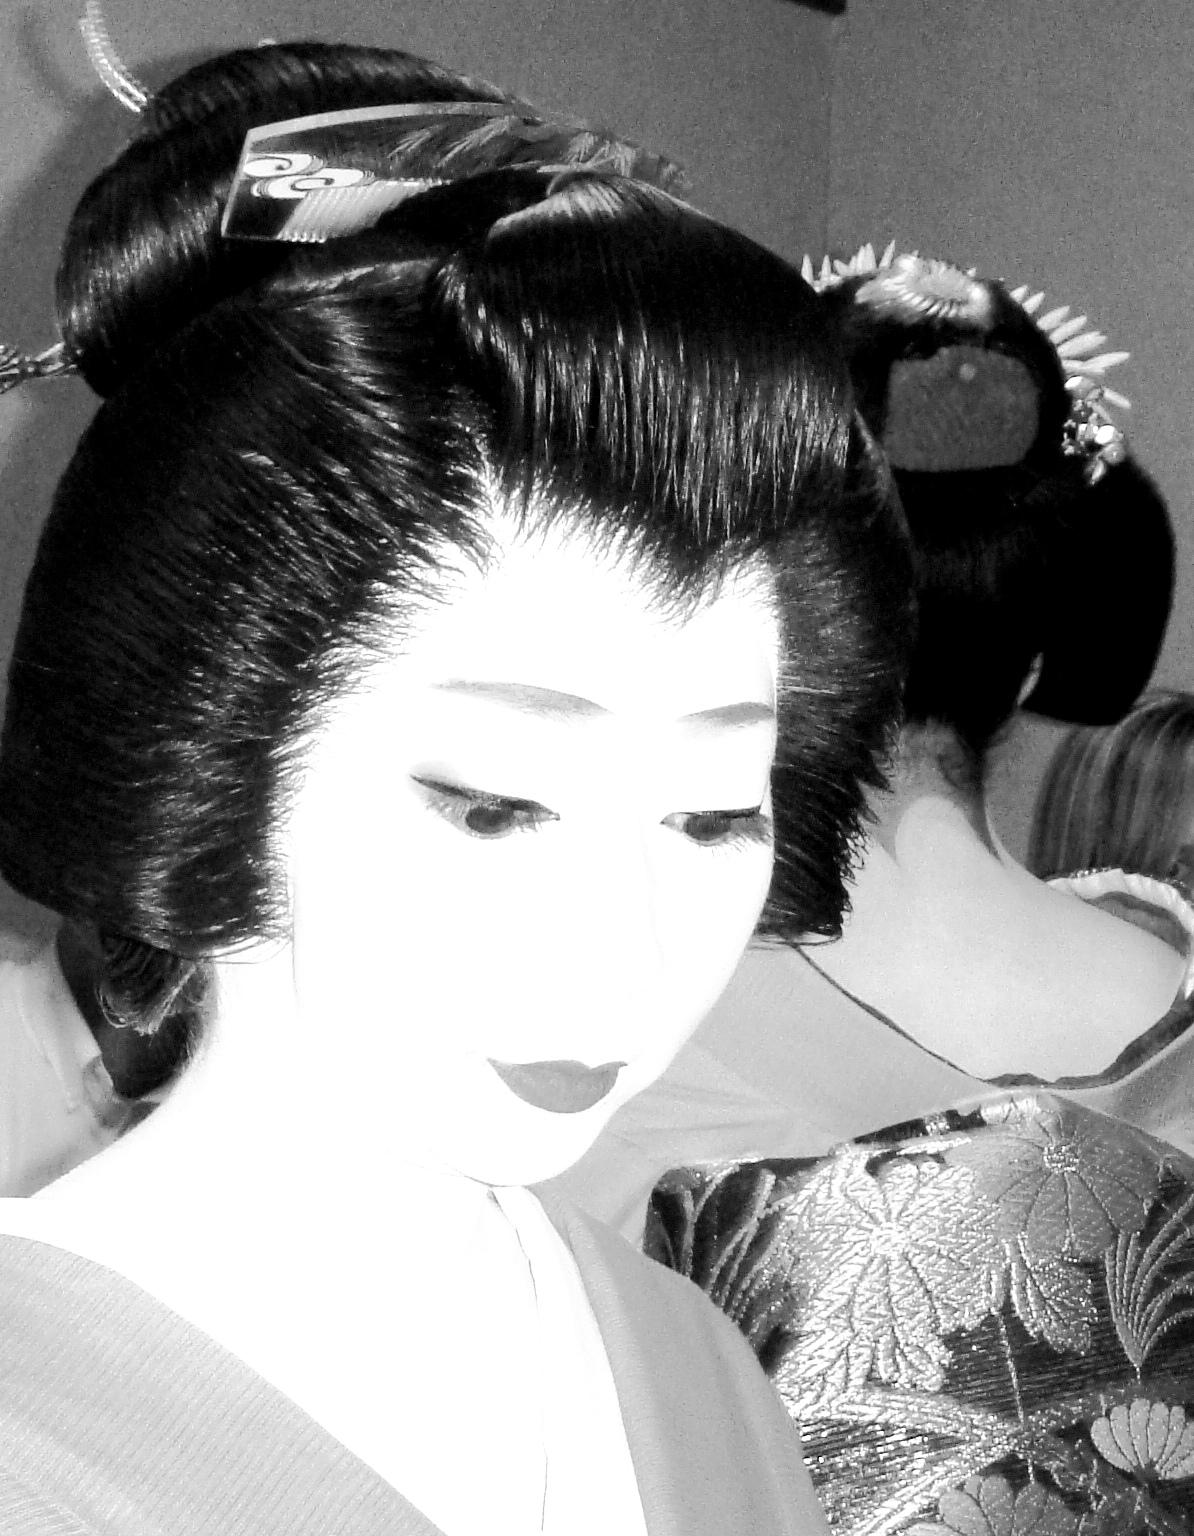 MY FAVORITE GEIKO IN KYOTO